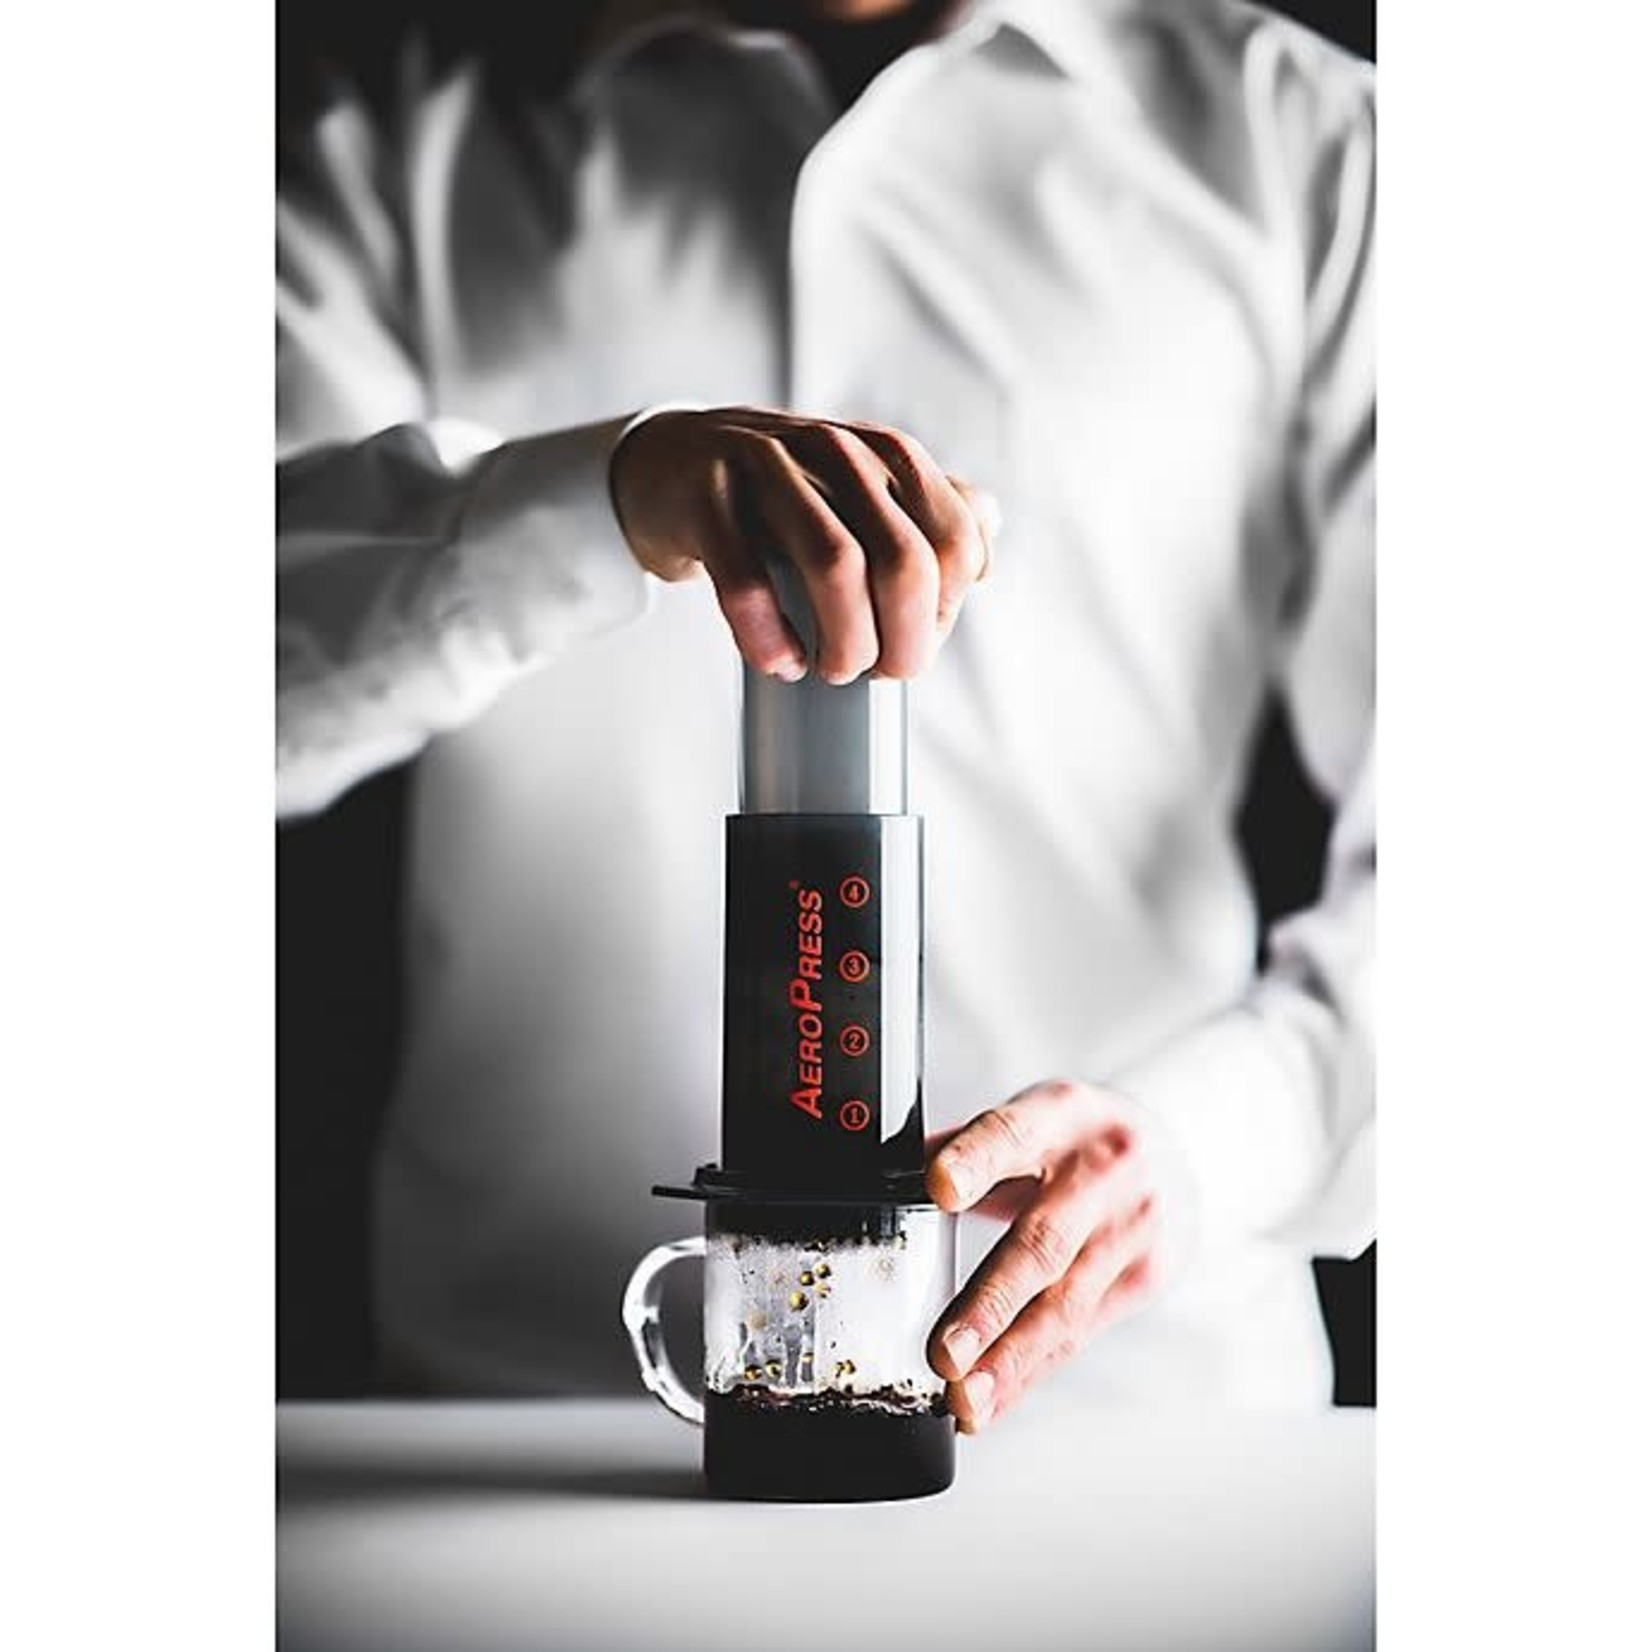 AeroPress AeroPress® Coffee & Espresso Maker